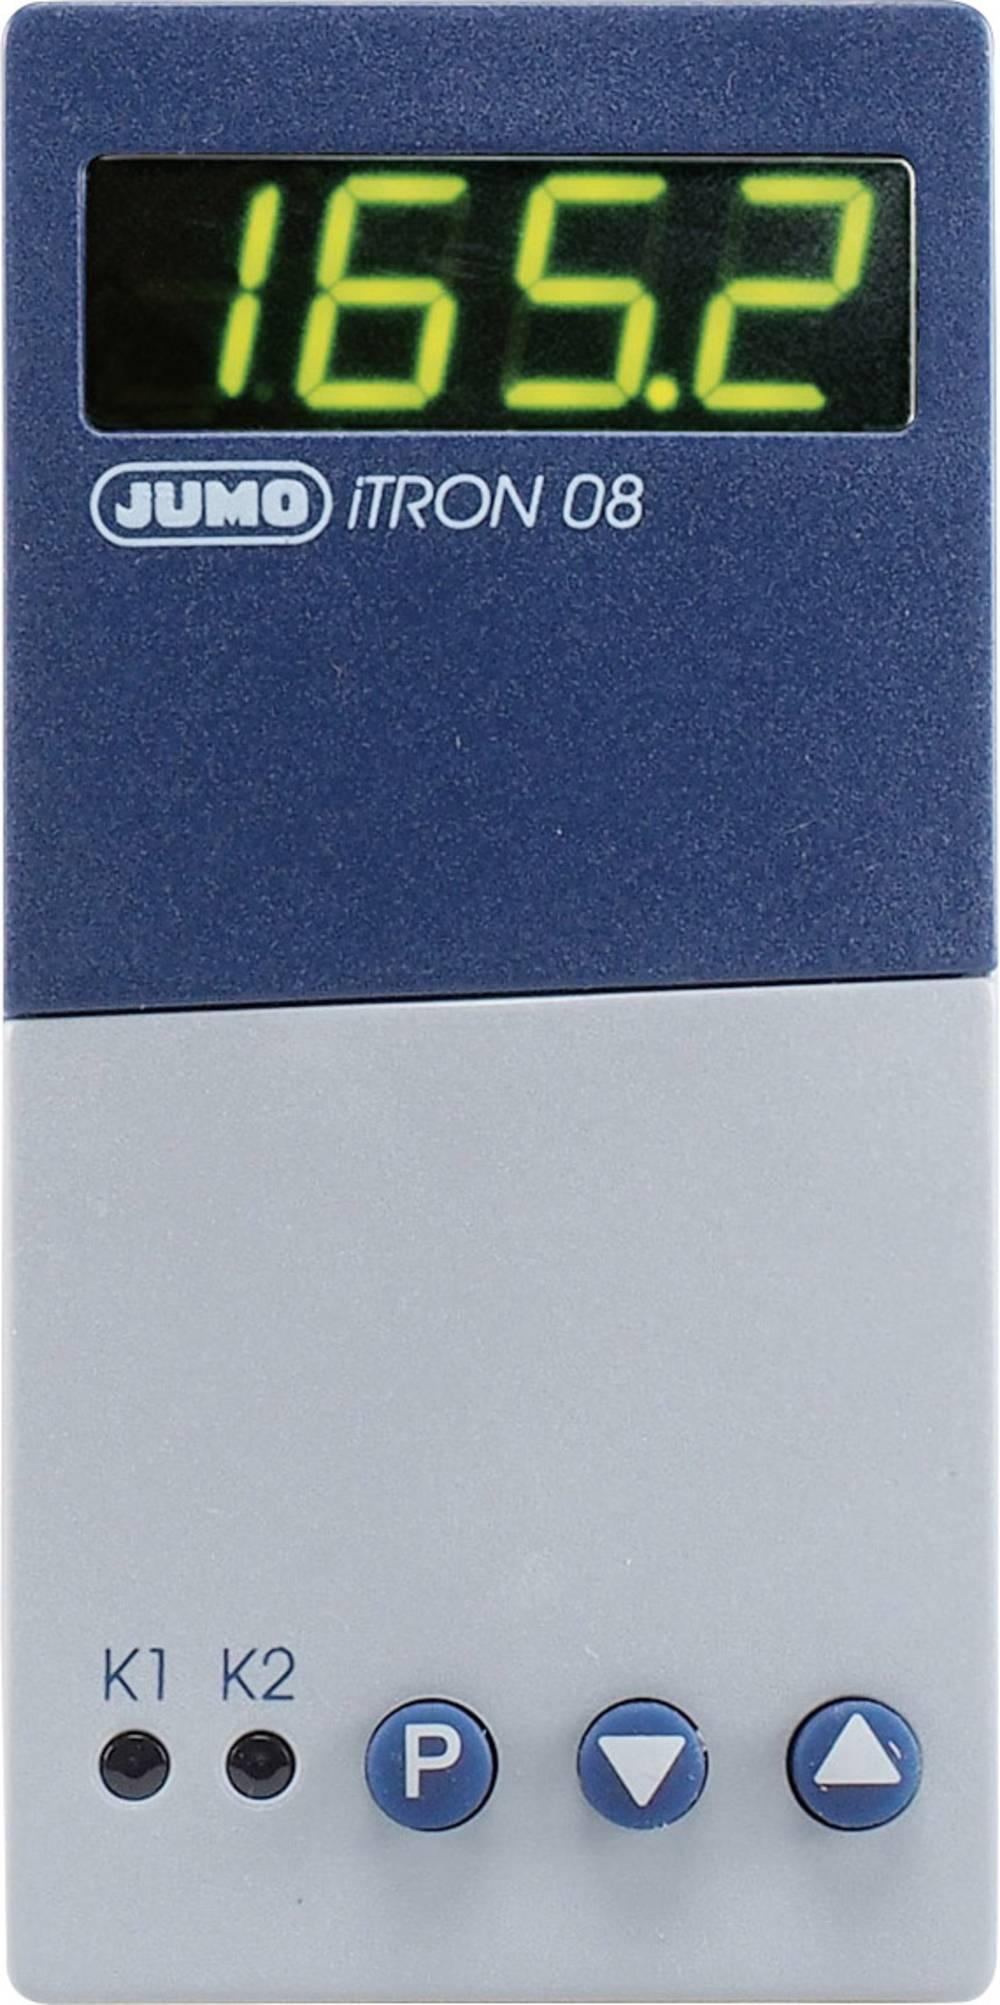 JUMO iTRON regulator mikroprocesora 702042/88-888-000-23/061, 210 110 - 240 V/AC